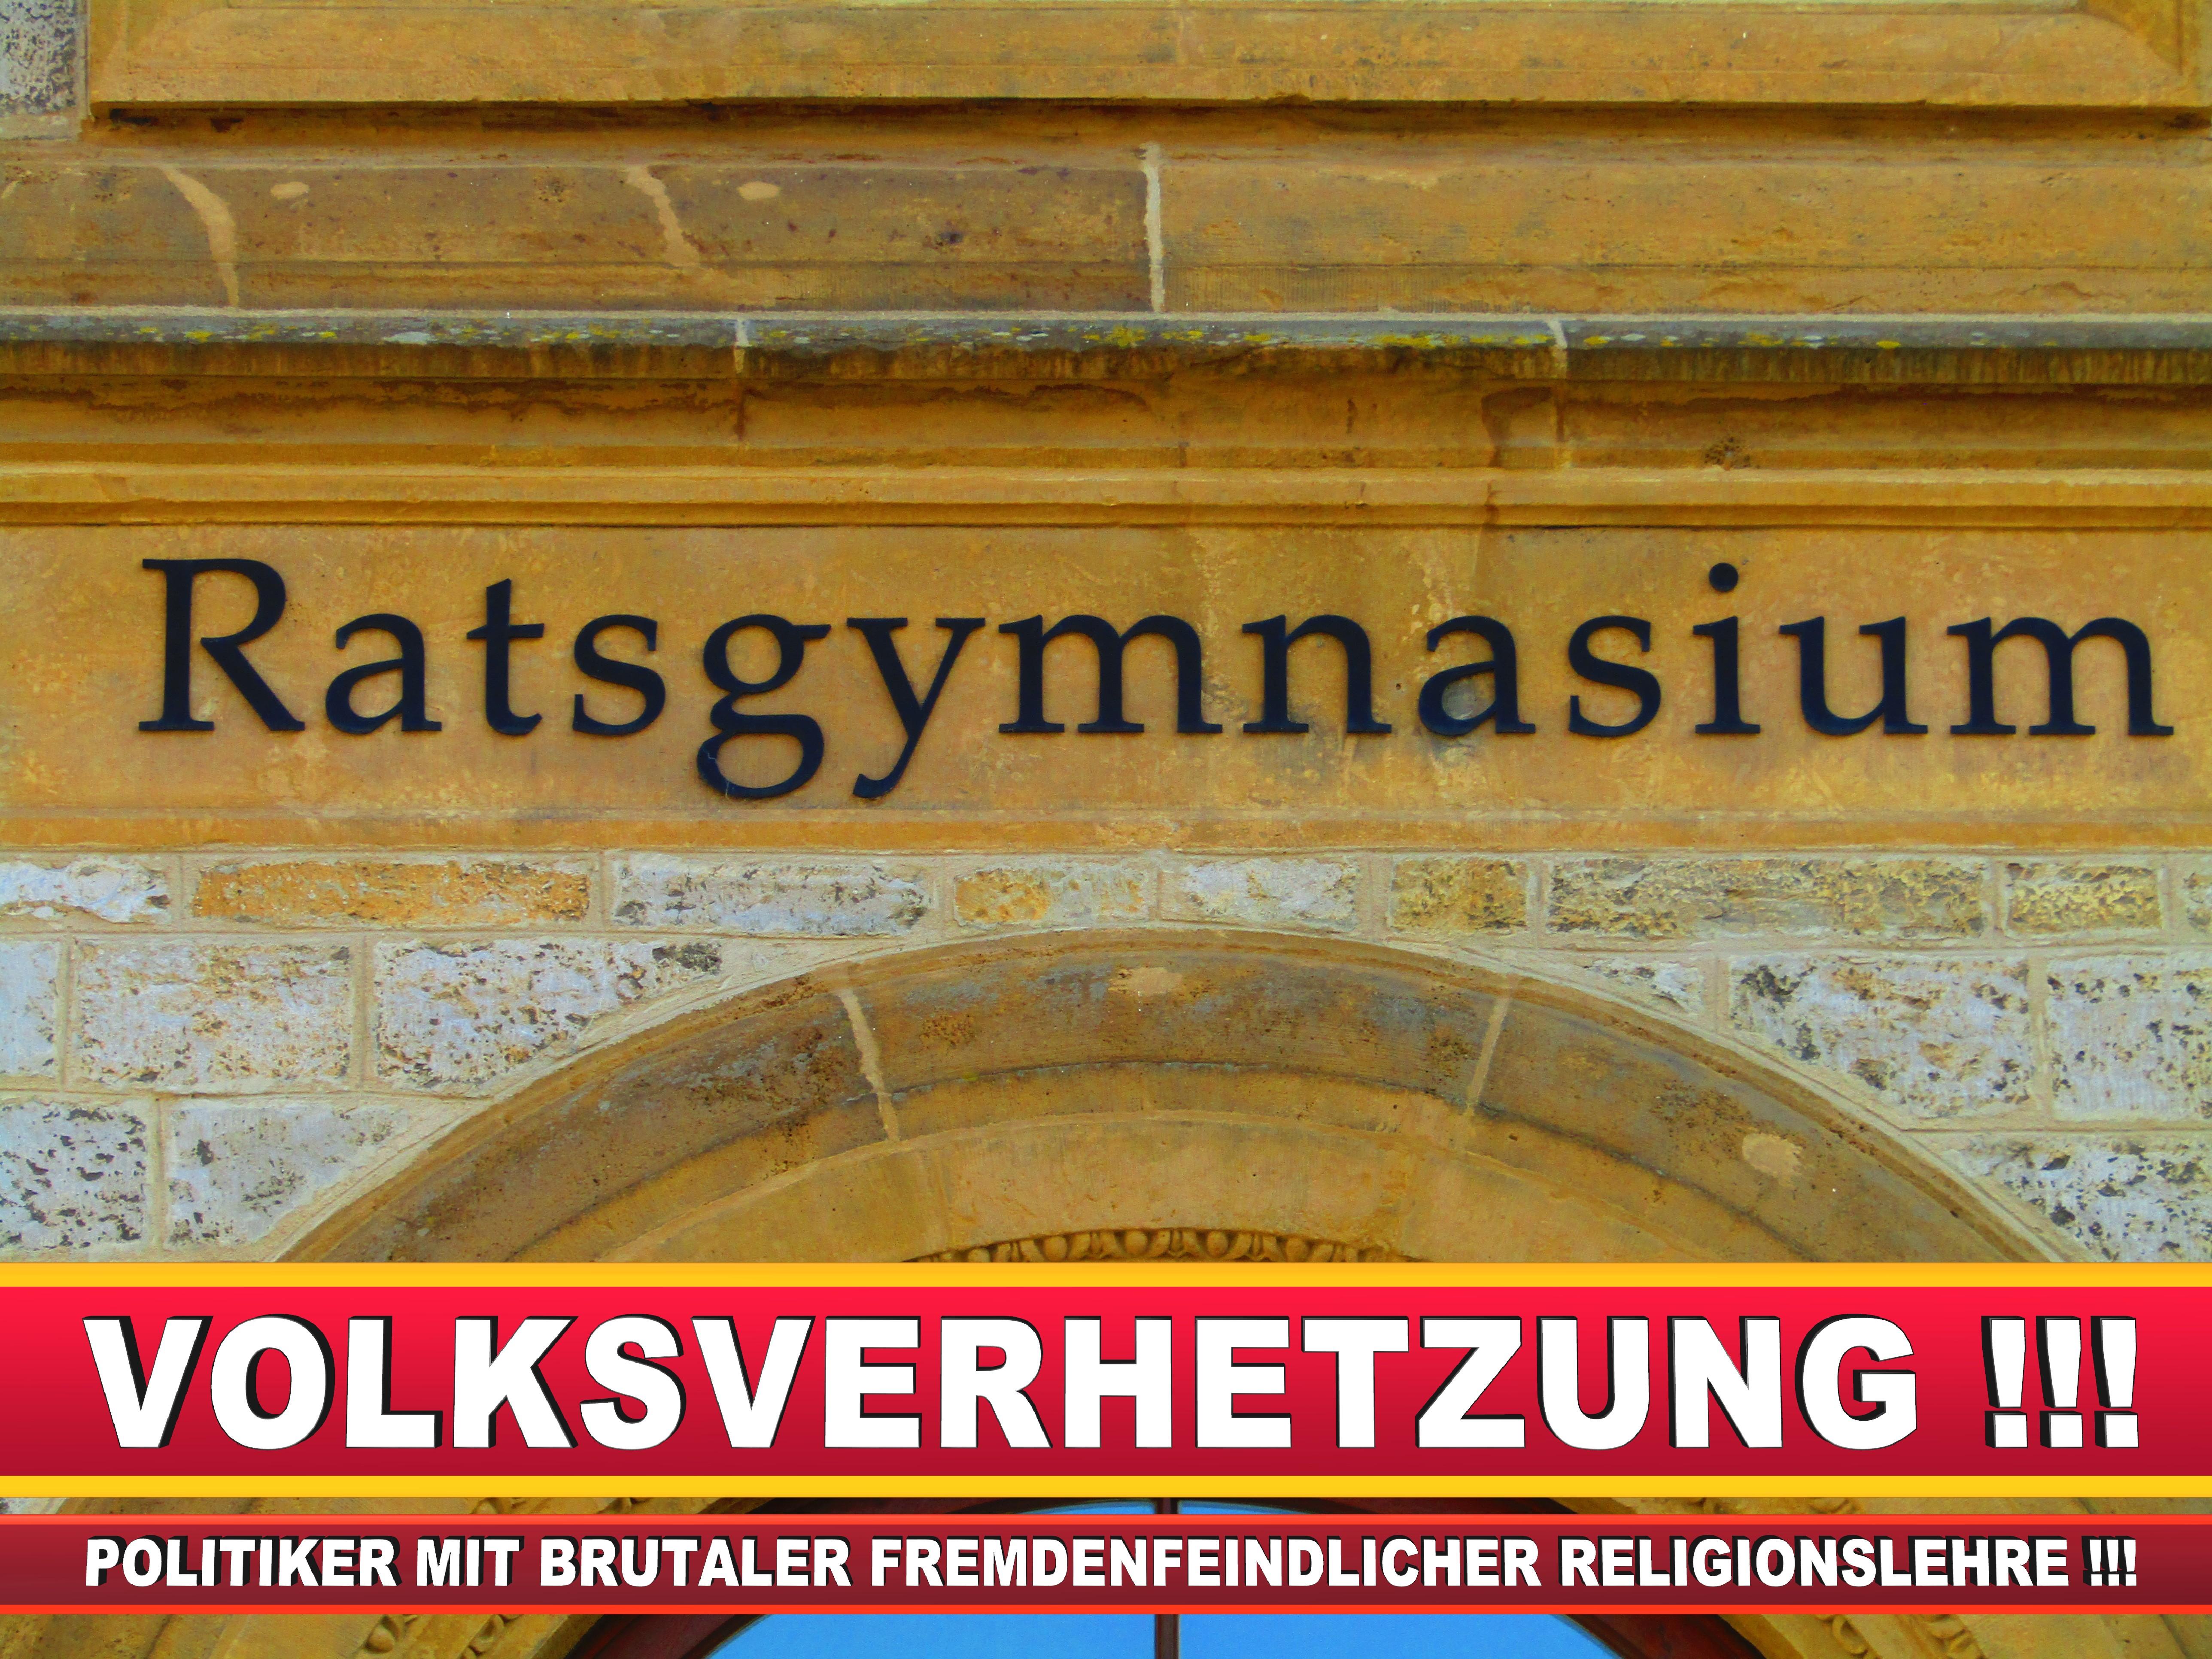 RATSGYMNASIUM BIELEFELD NORMAN GRAESER CDU BIELEFELD (1) LANDTAGSWAHL BUNDESTAGSWAHL BÜRGERMEISTERWAHL